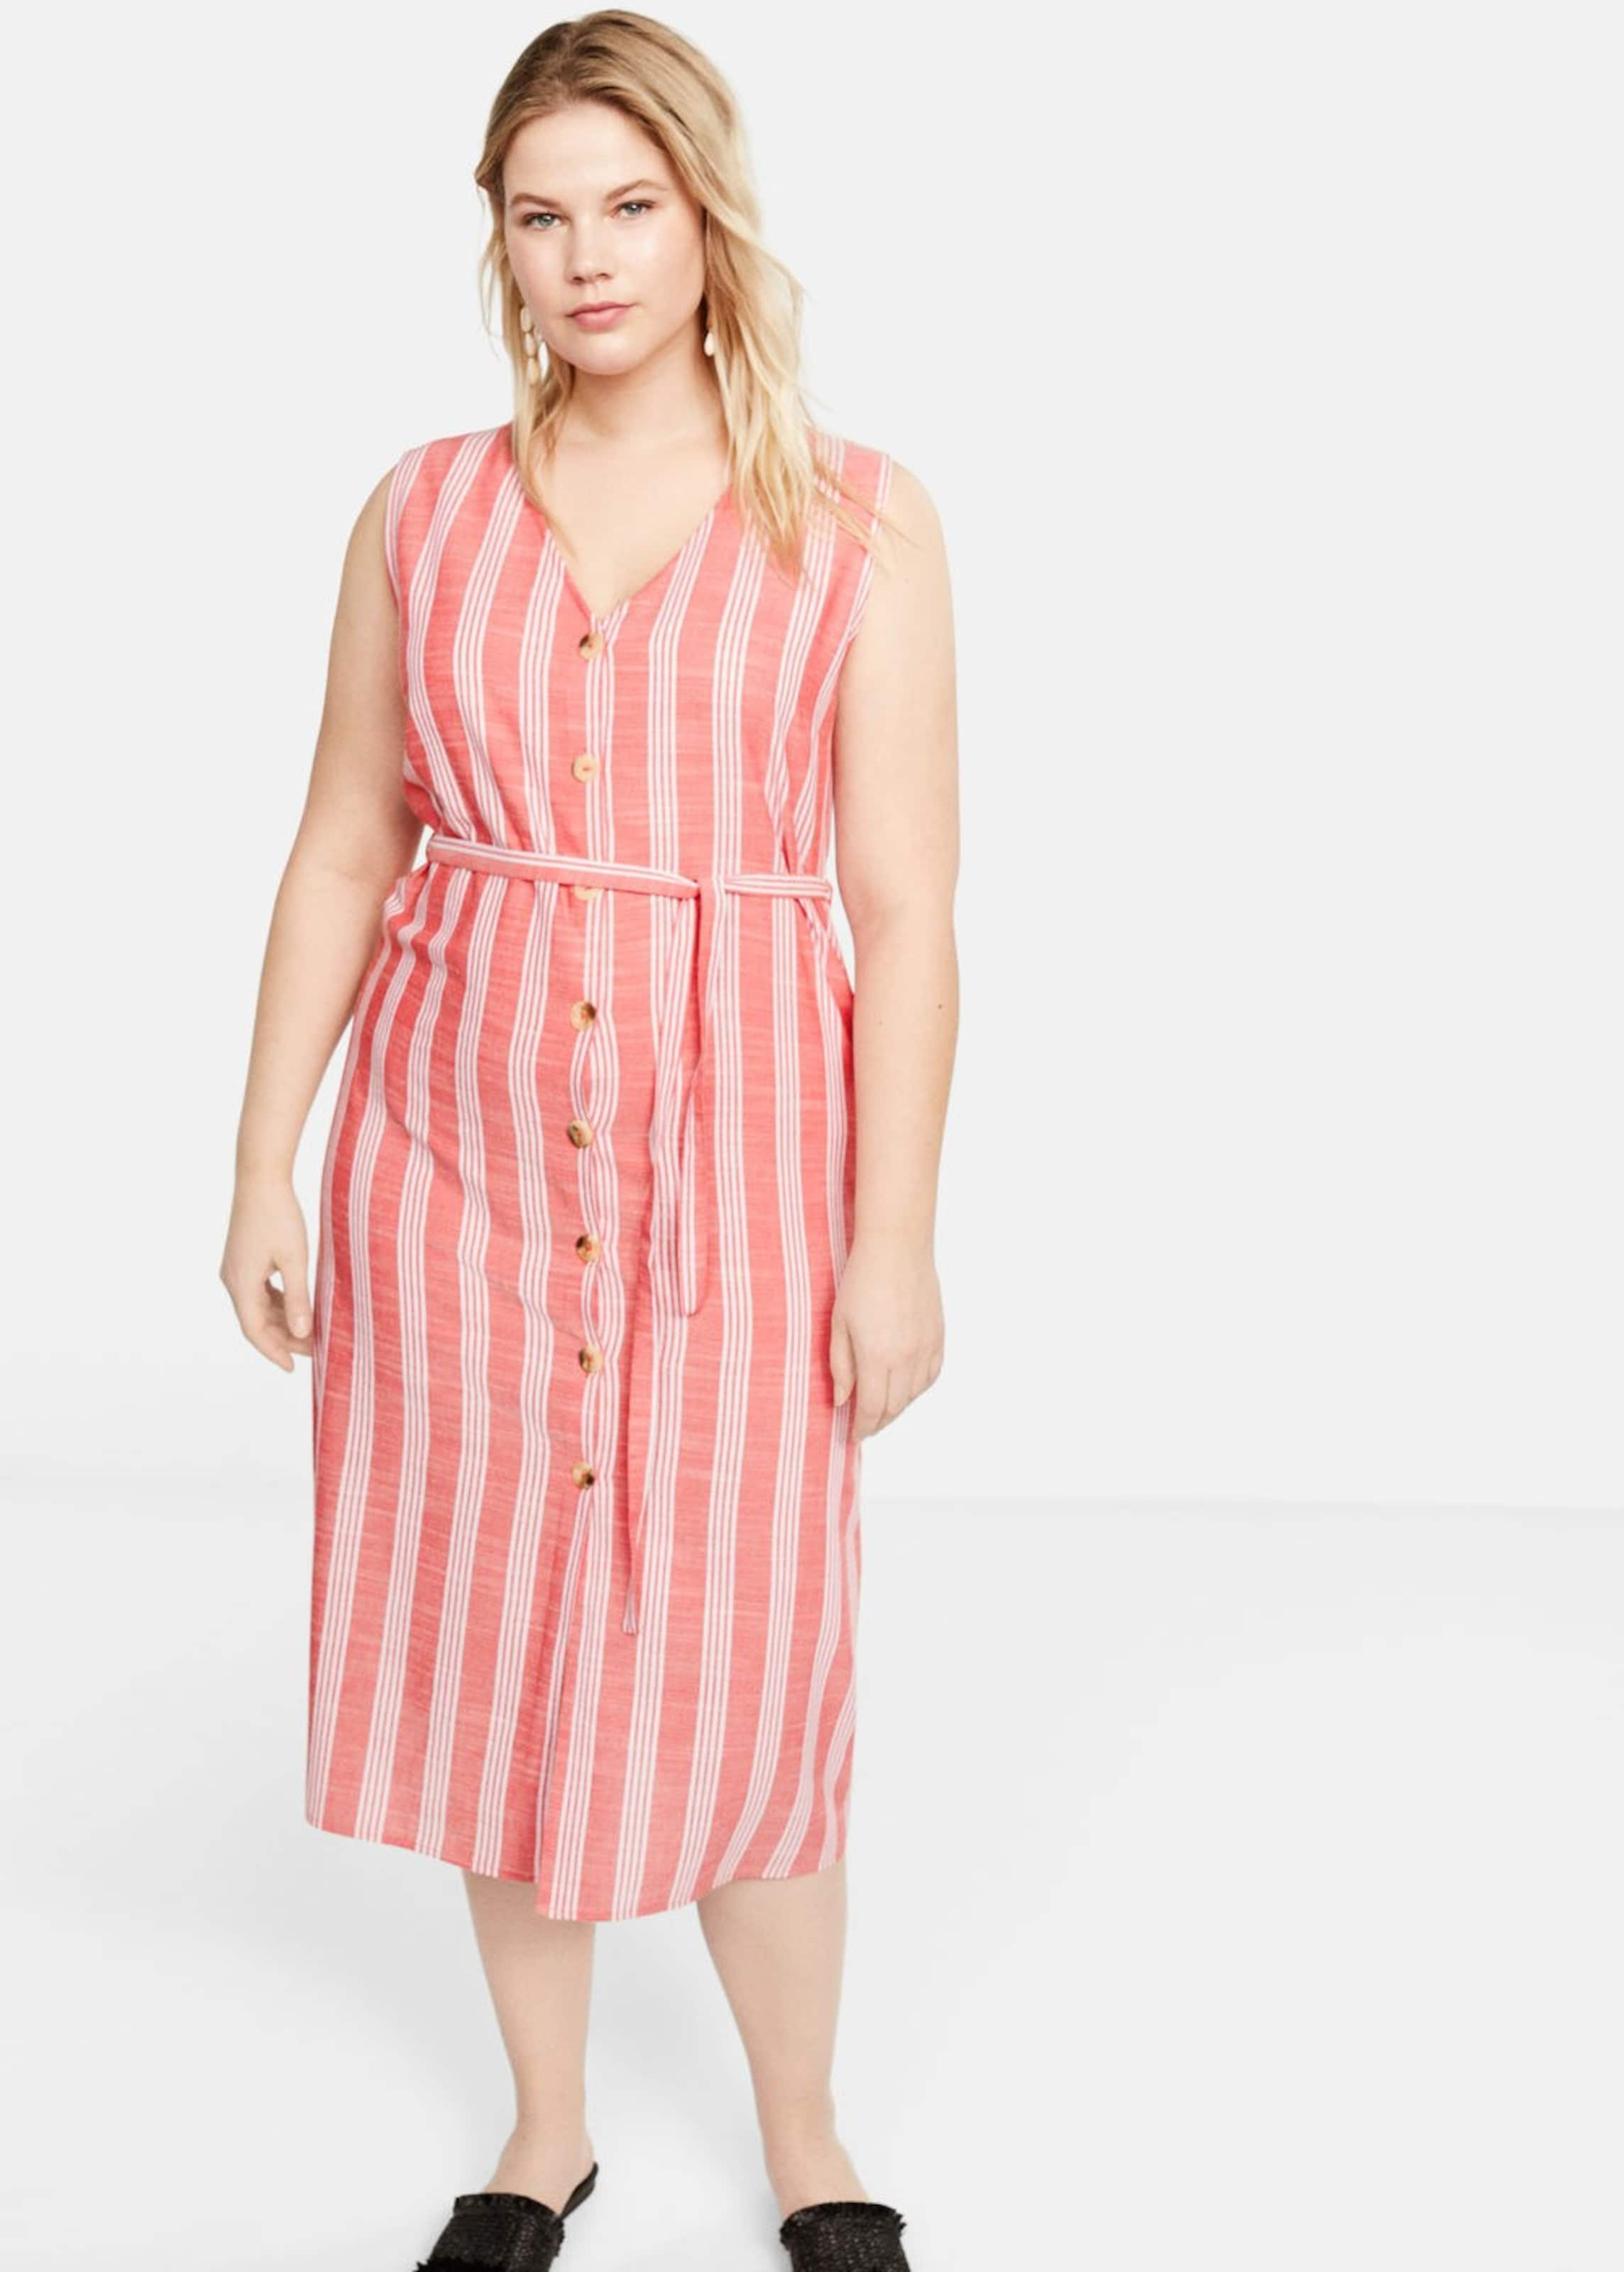 Mango Rosa Kleid In Violeta By D9IH2E